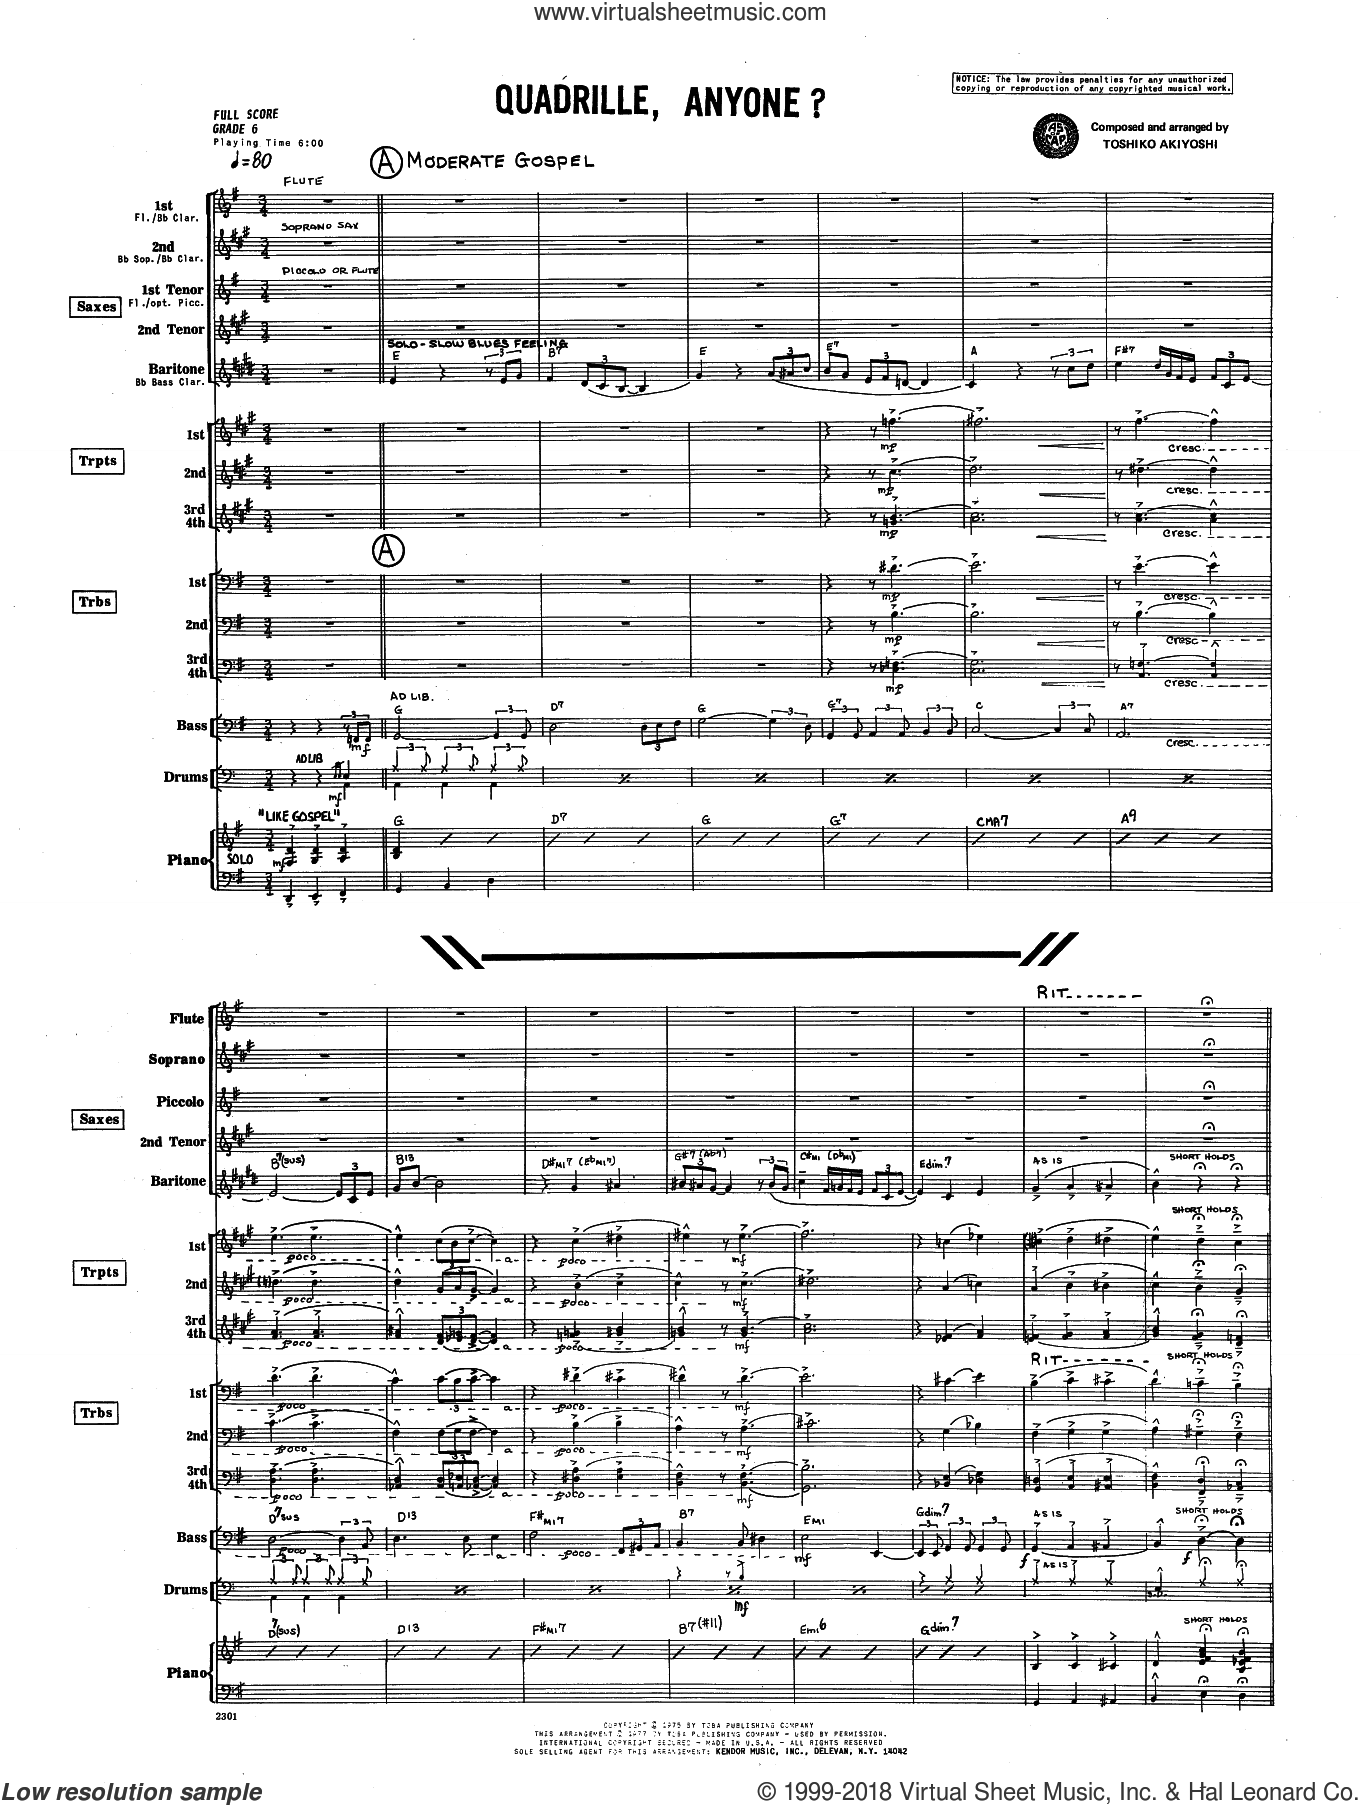 Quadrille, Anyone? (COMPLETE) sheet music for jazz band by Toshiko Akiyoshi, intermediate skill level